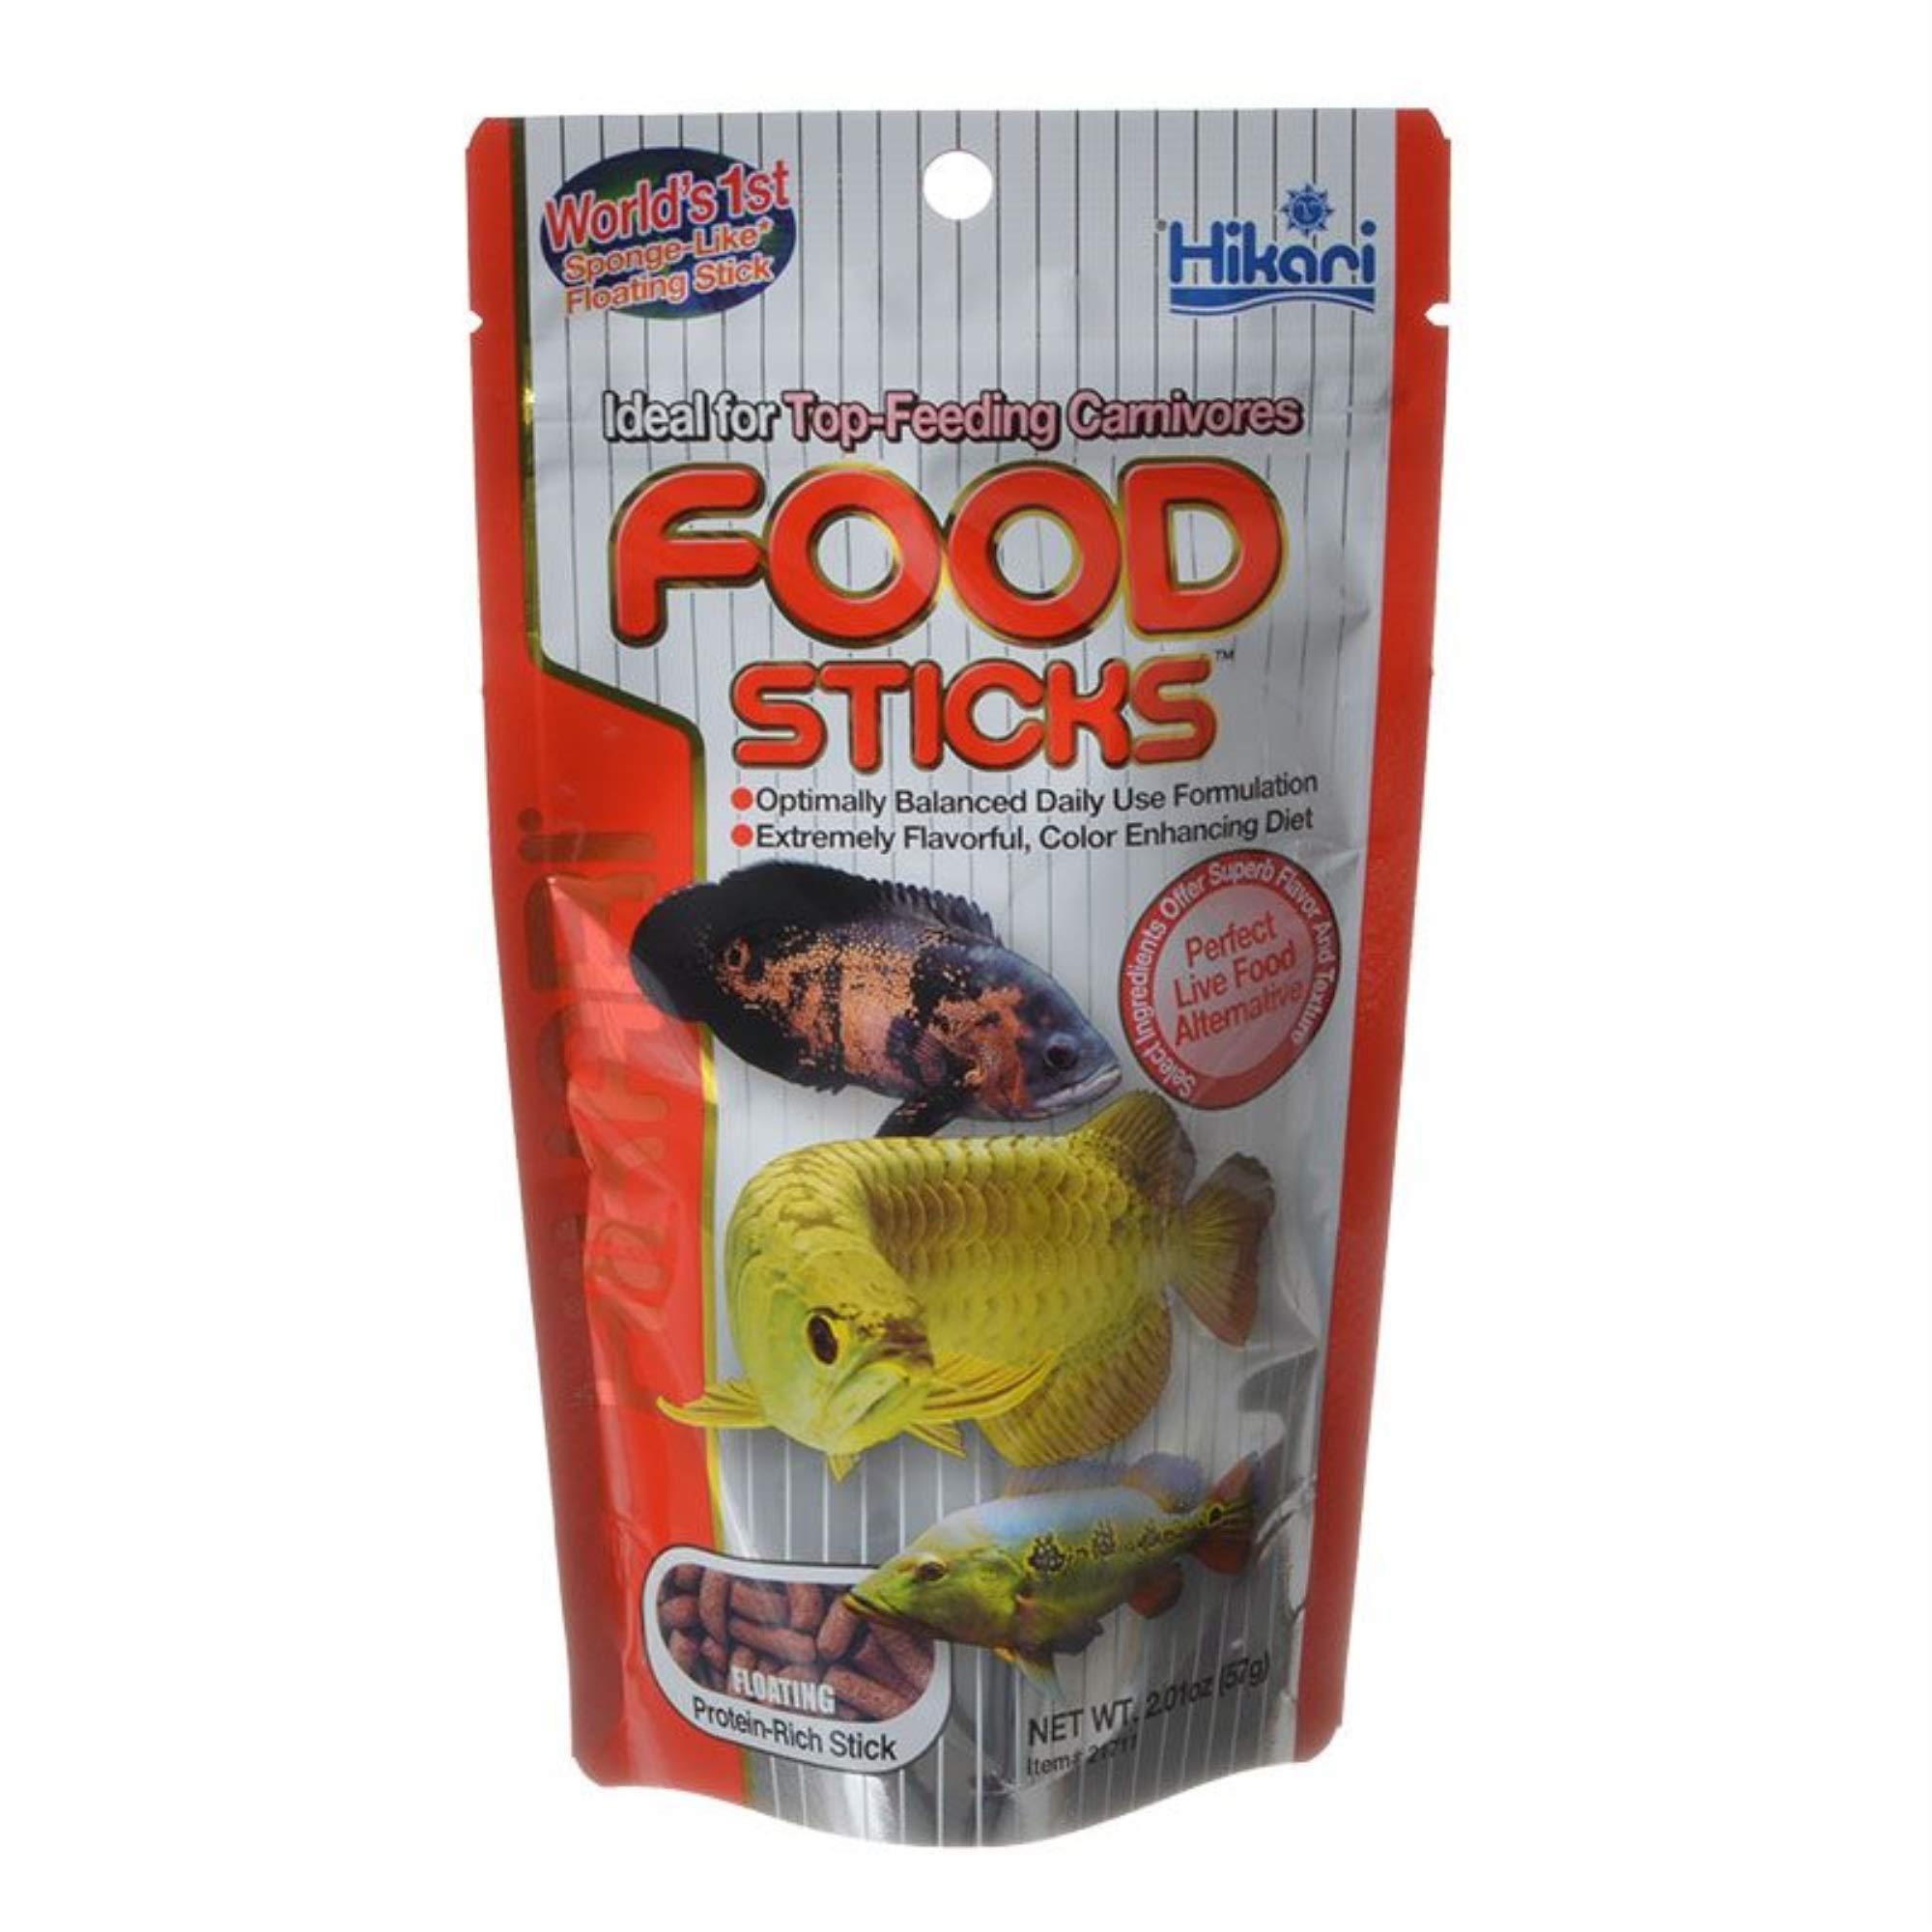 Hikari Floating Food Sticks for Pets, 2.2-Pound by Hikari